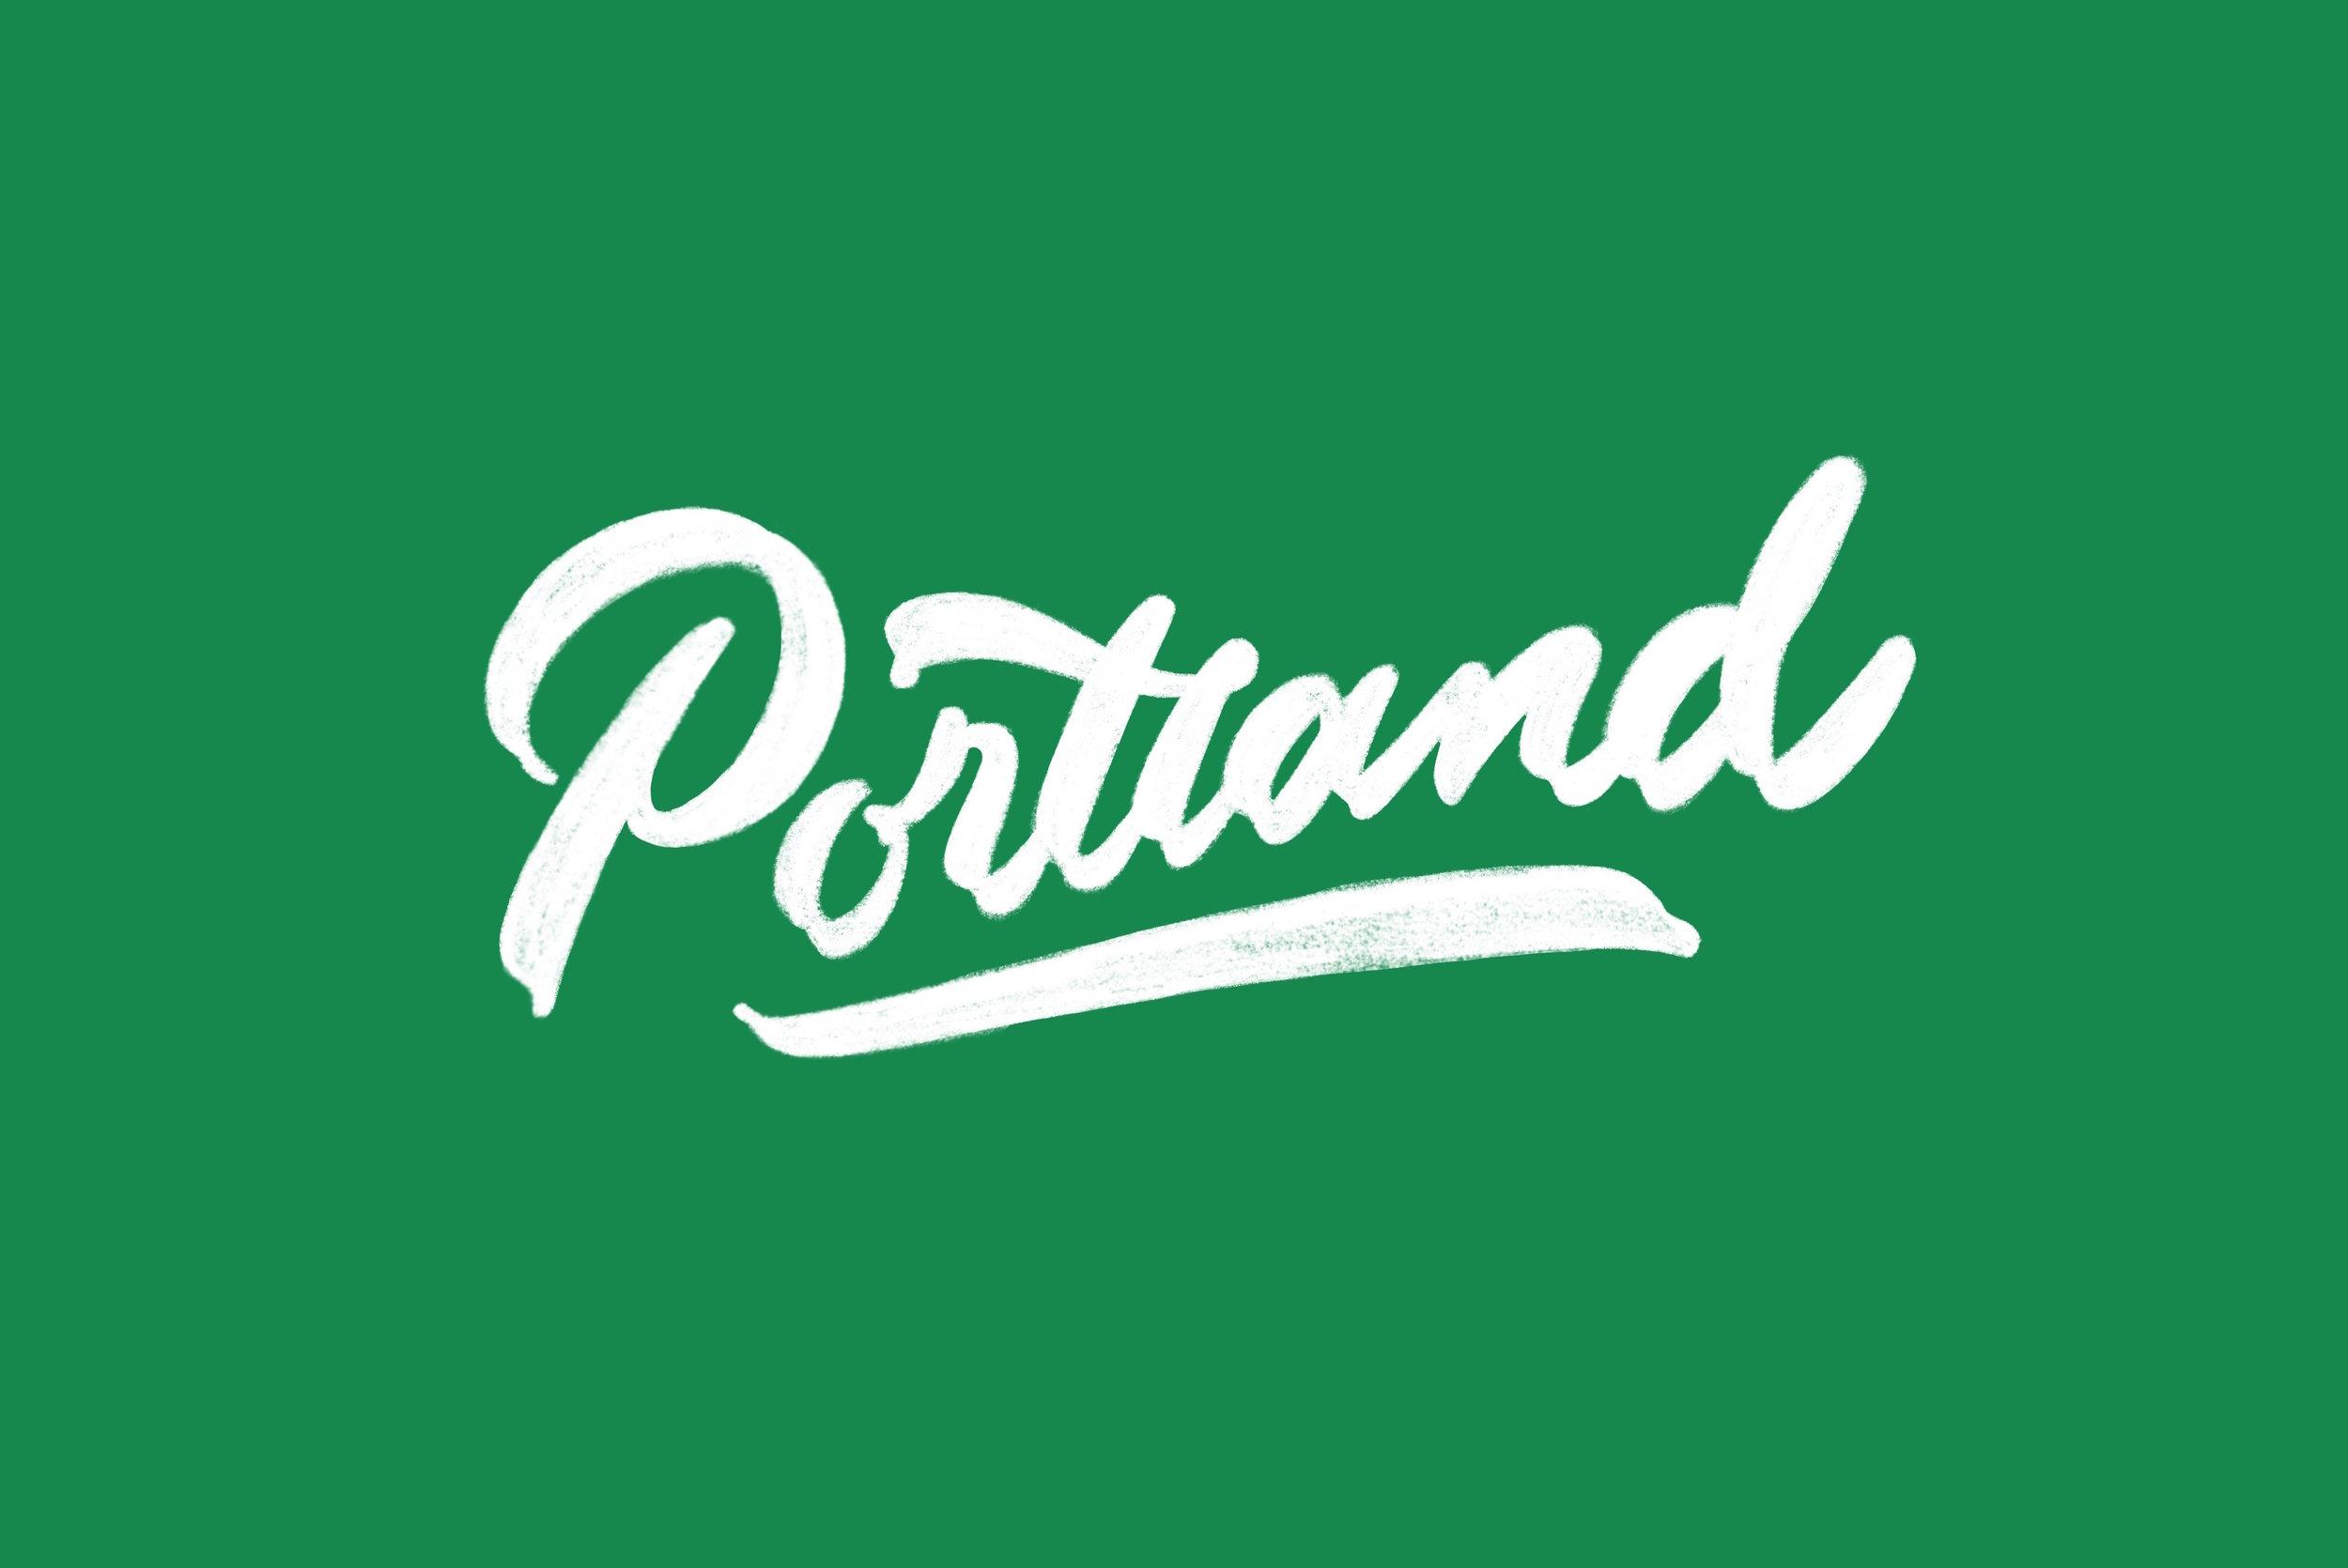 Lettering_Portland_design.jpg